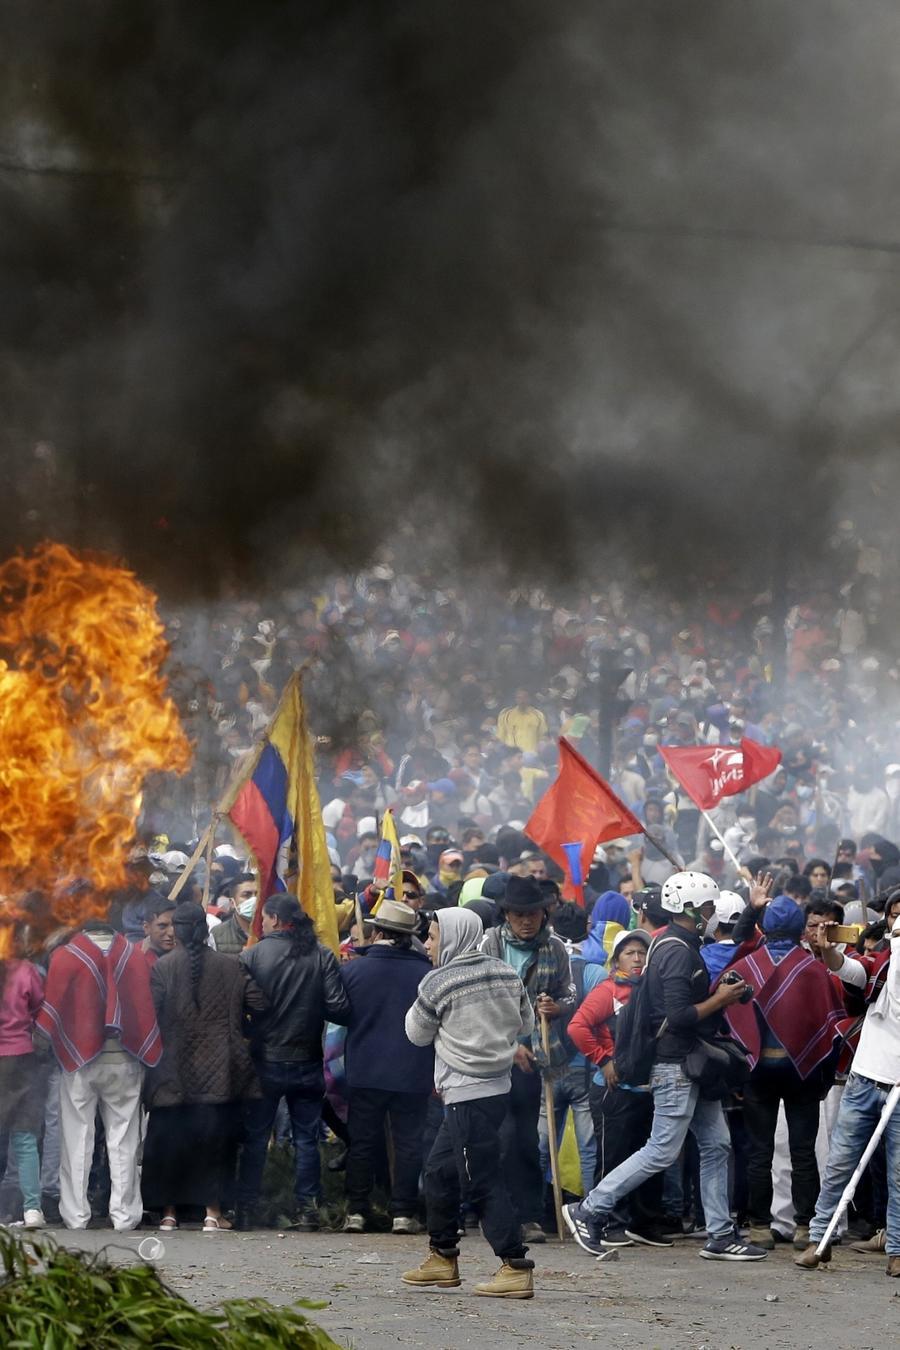 Miles de manifestantes se enfrentaron con las autoridades en un intento de tomar la Asamblea Nacional en Quito